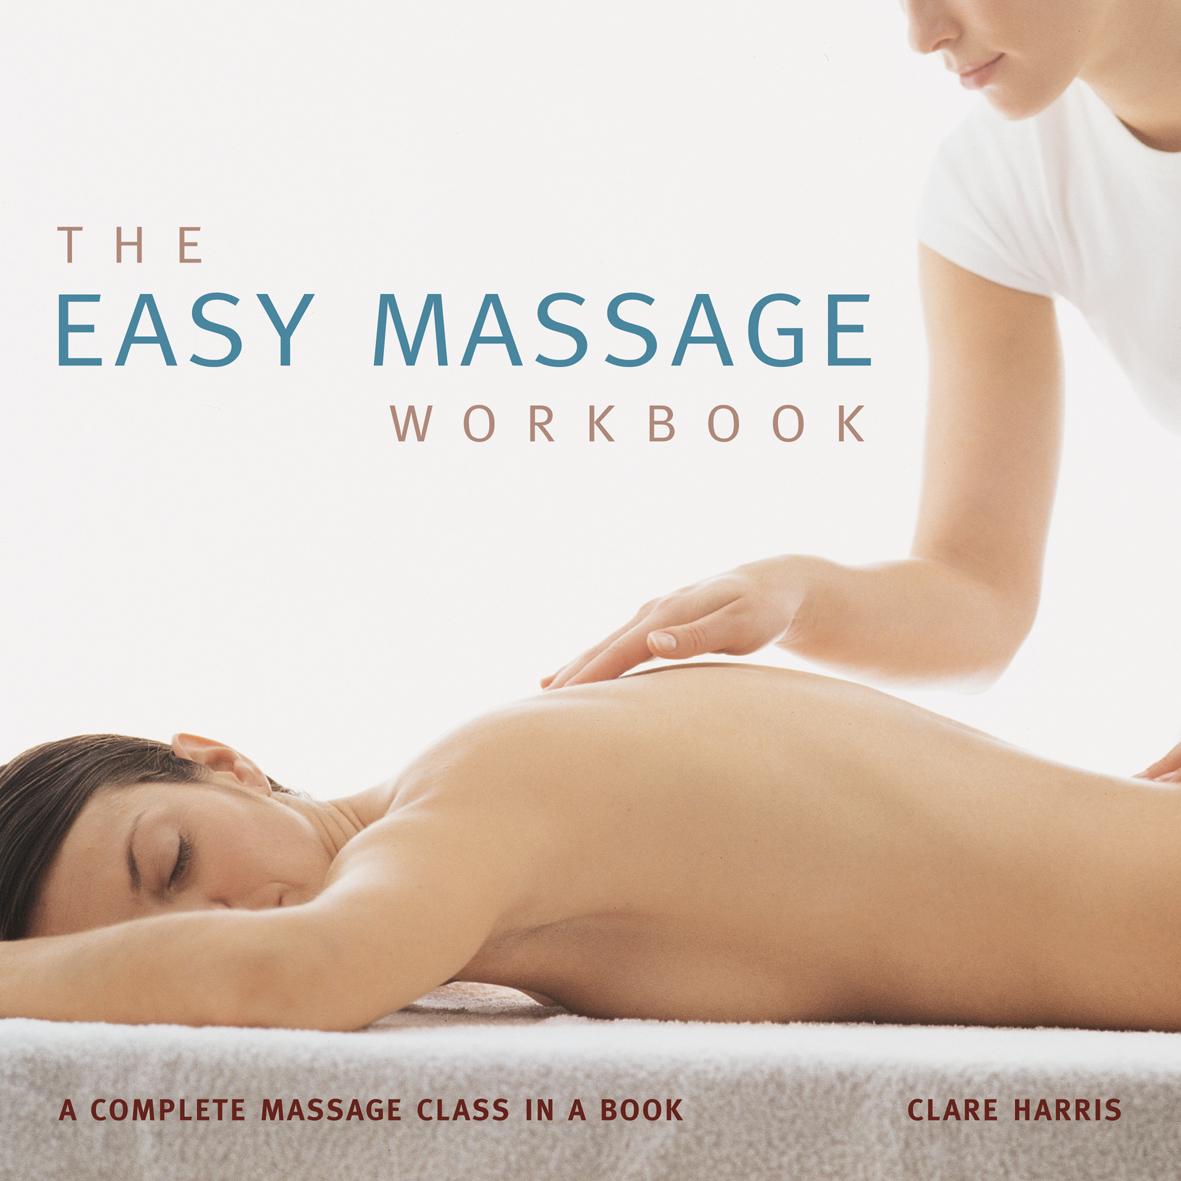 A complete massage class in a book